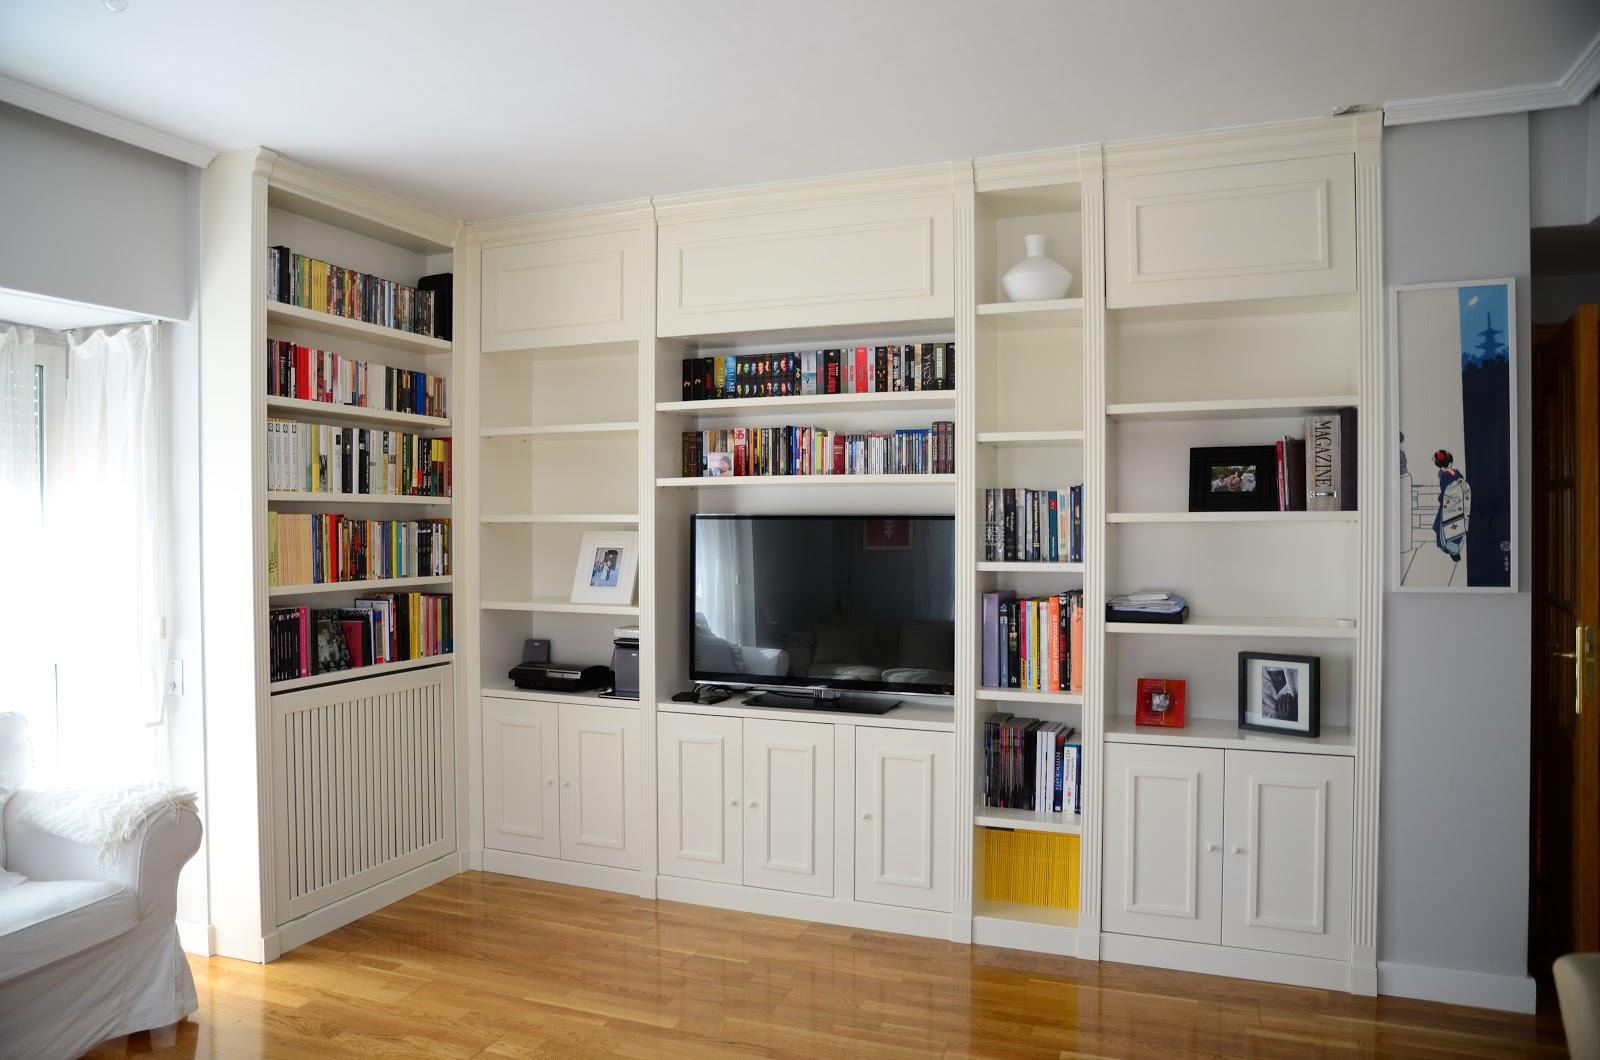 Libreria a medida madrid mueble a medida 617075183 elcarpinterodemadrid librerias a - Estanterias a medida ...